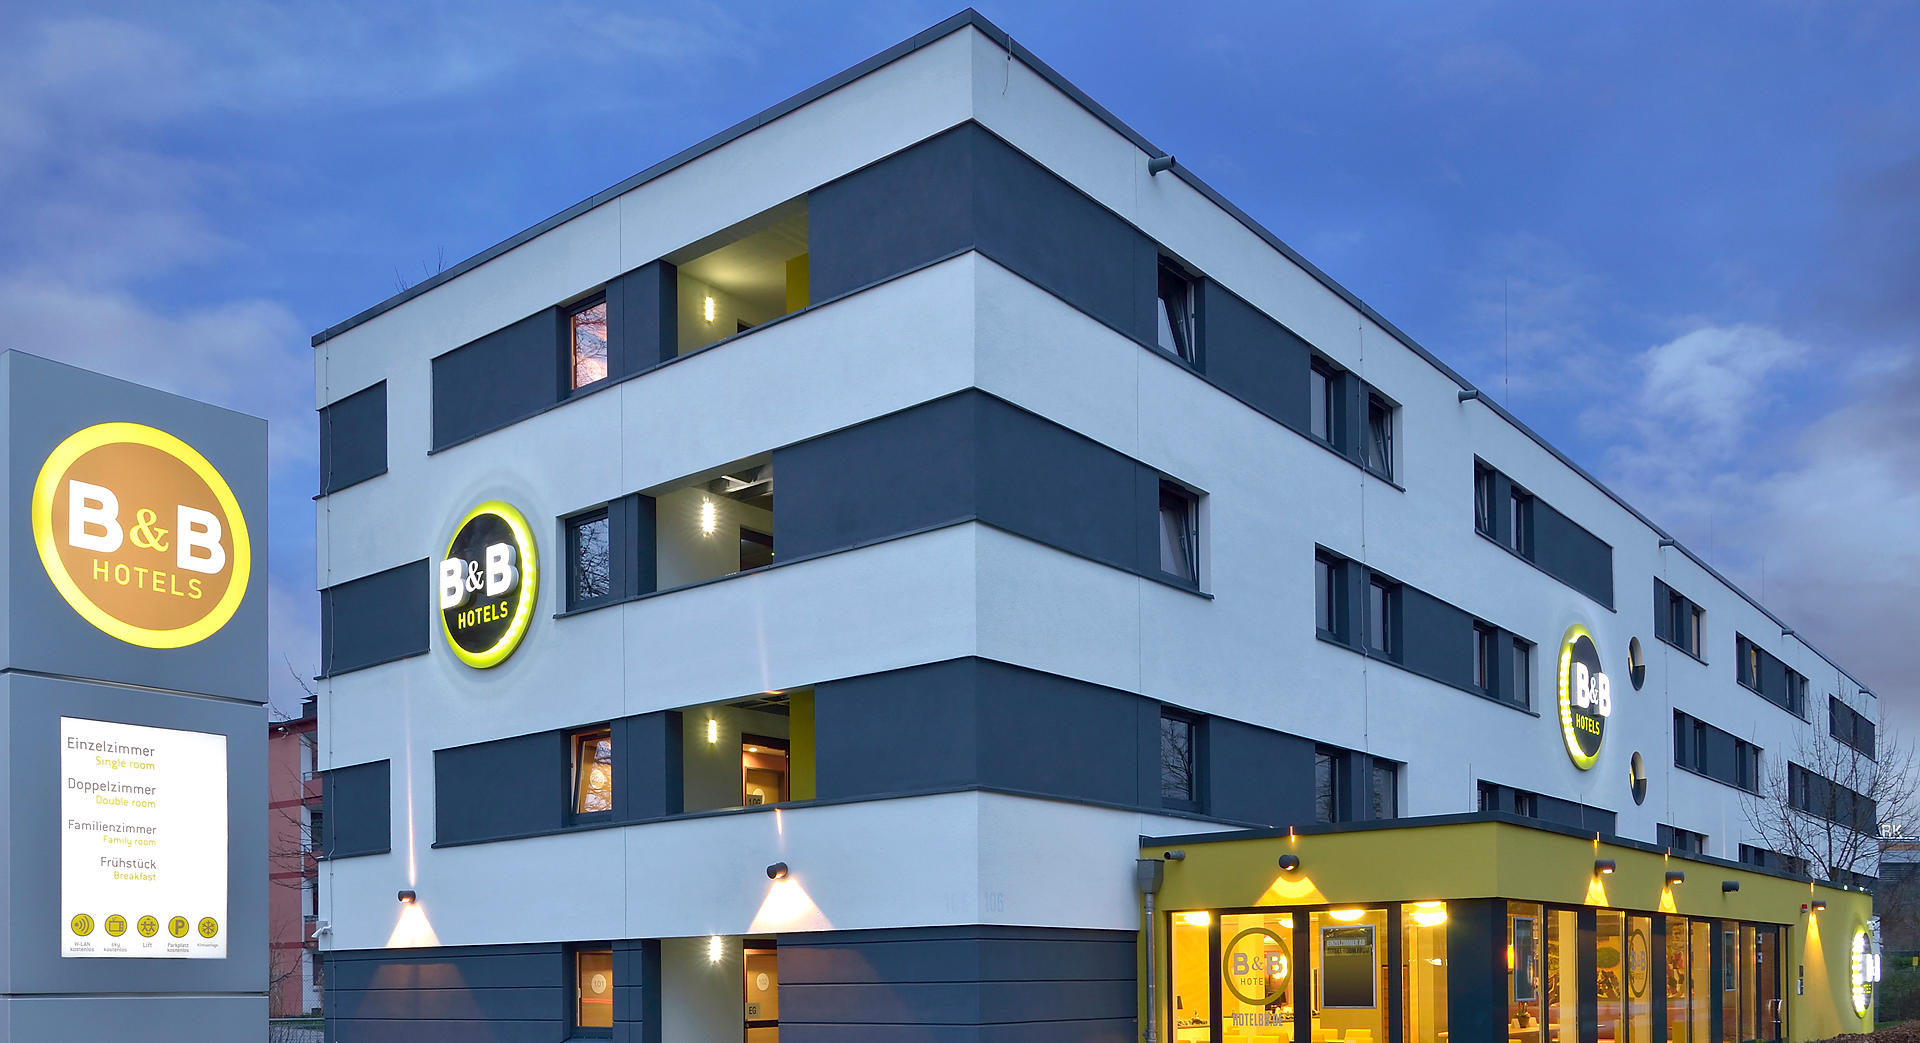 B&B Hotel Dortmund-Messe, Wittekindstr. 106 in Dortmund